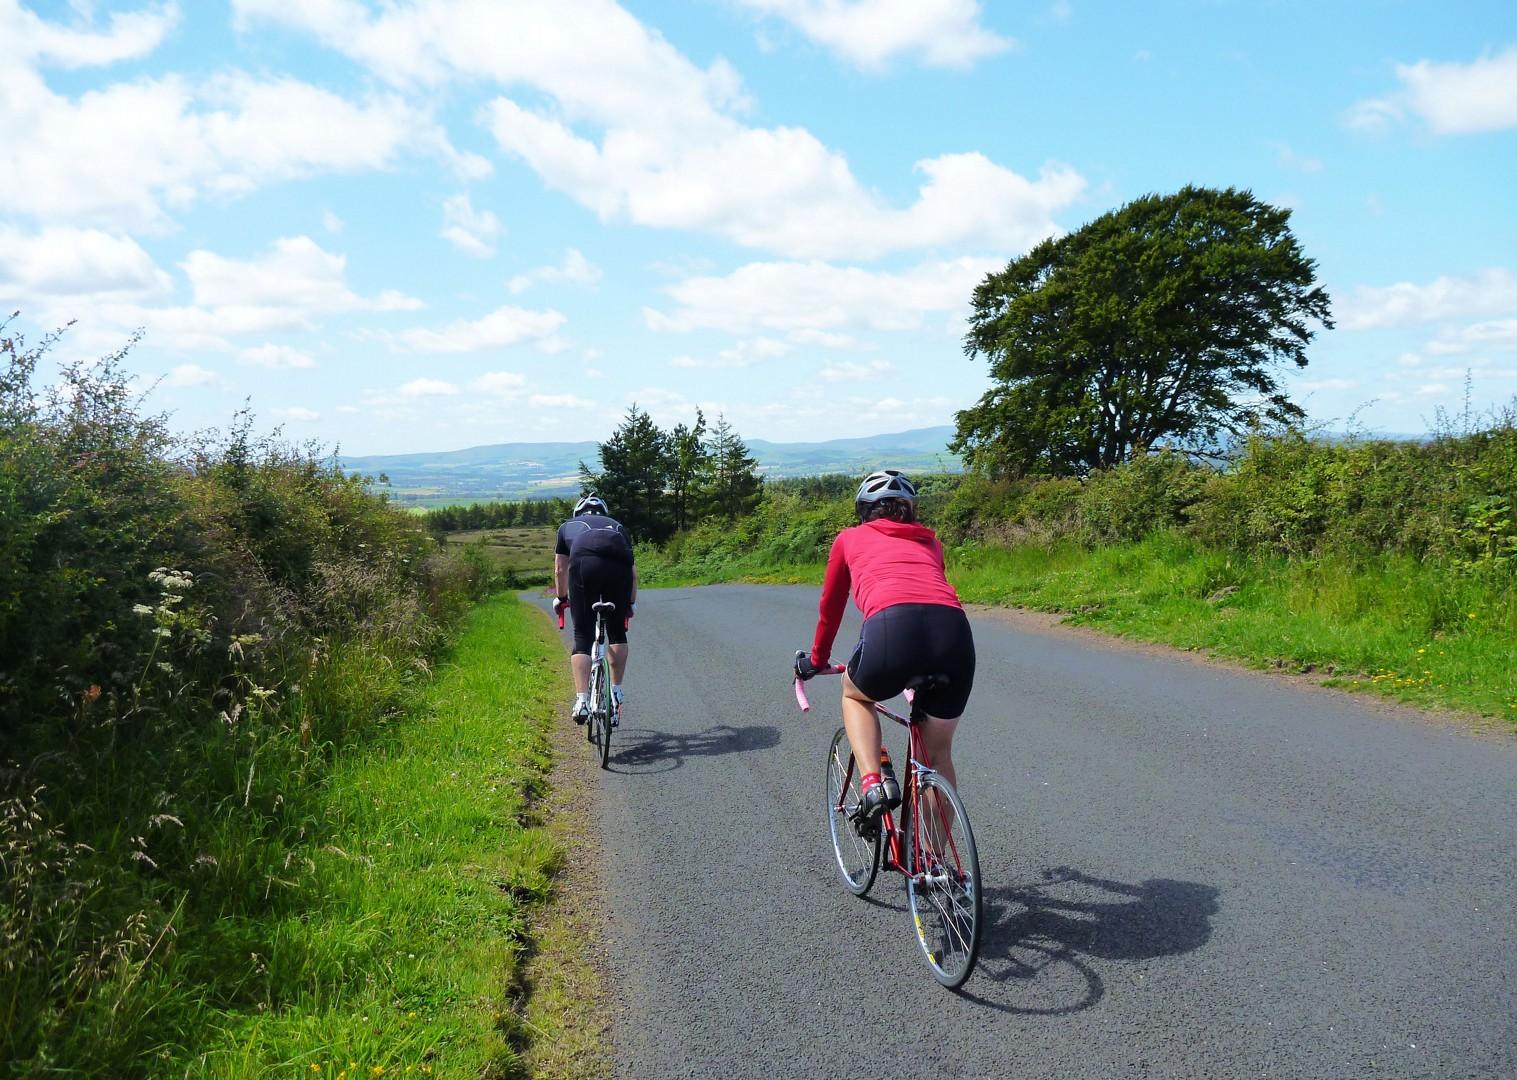 uk-group-cycling-weekend.jpg - UK - Northumberland - Road Cycling